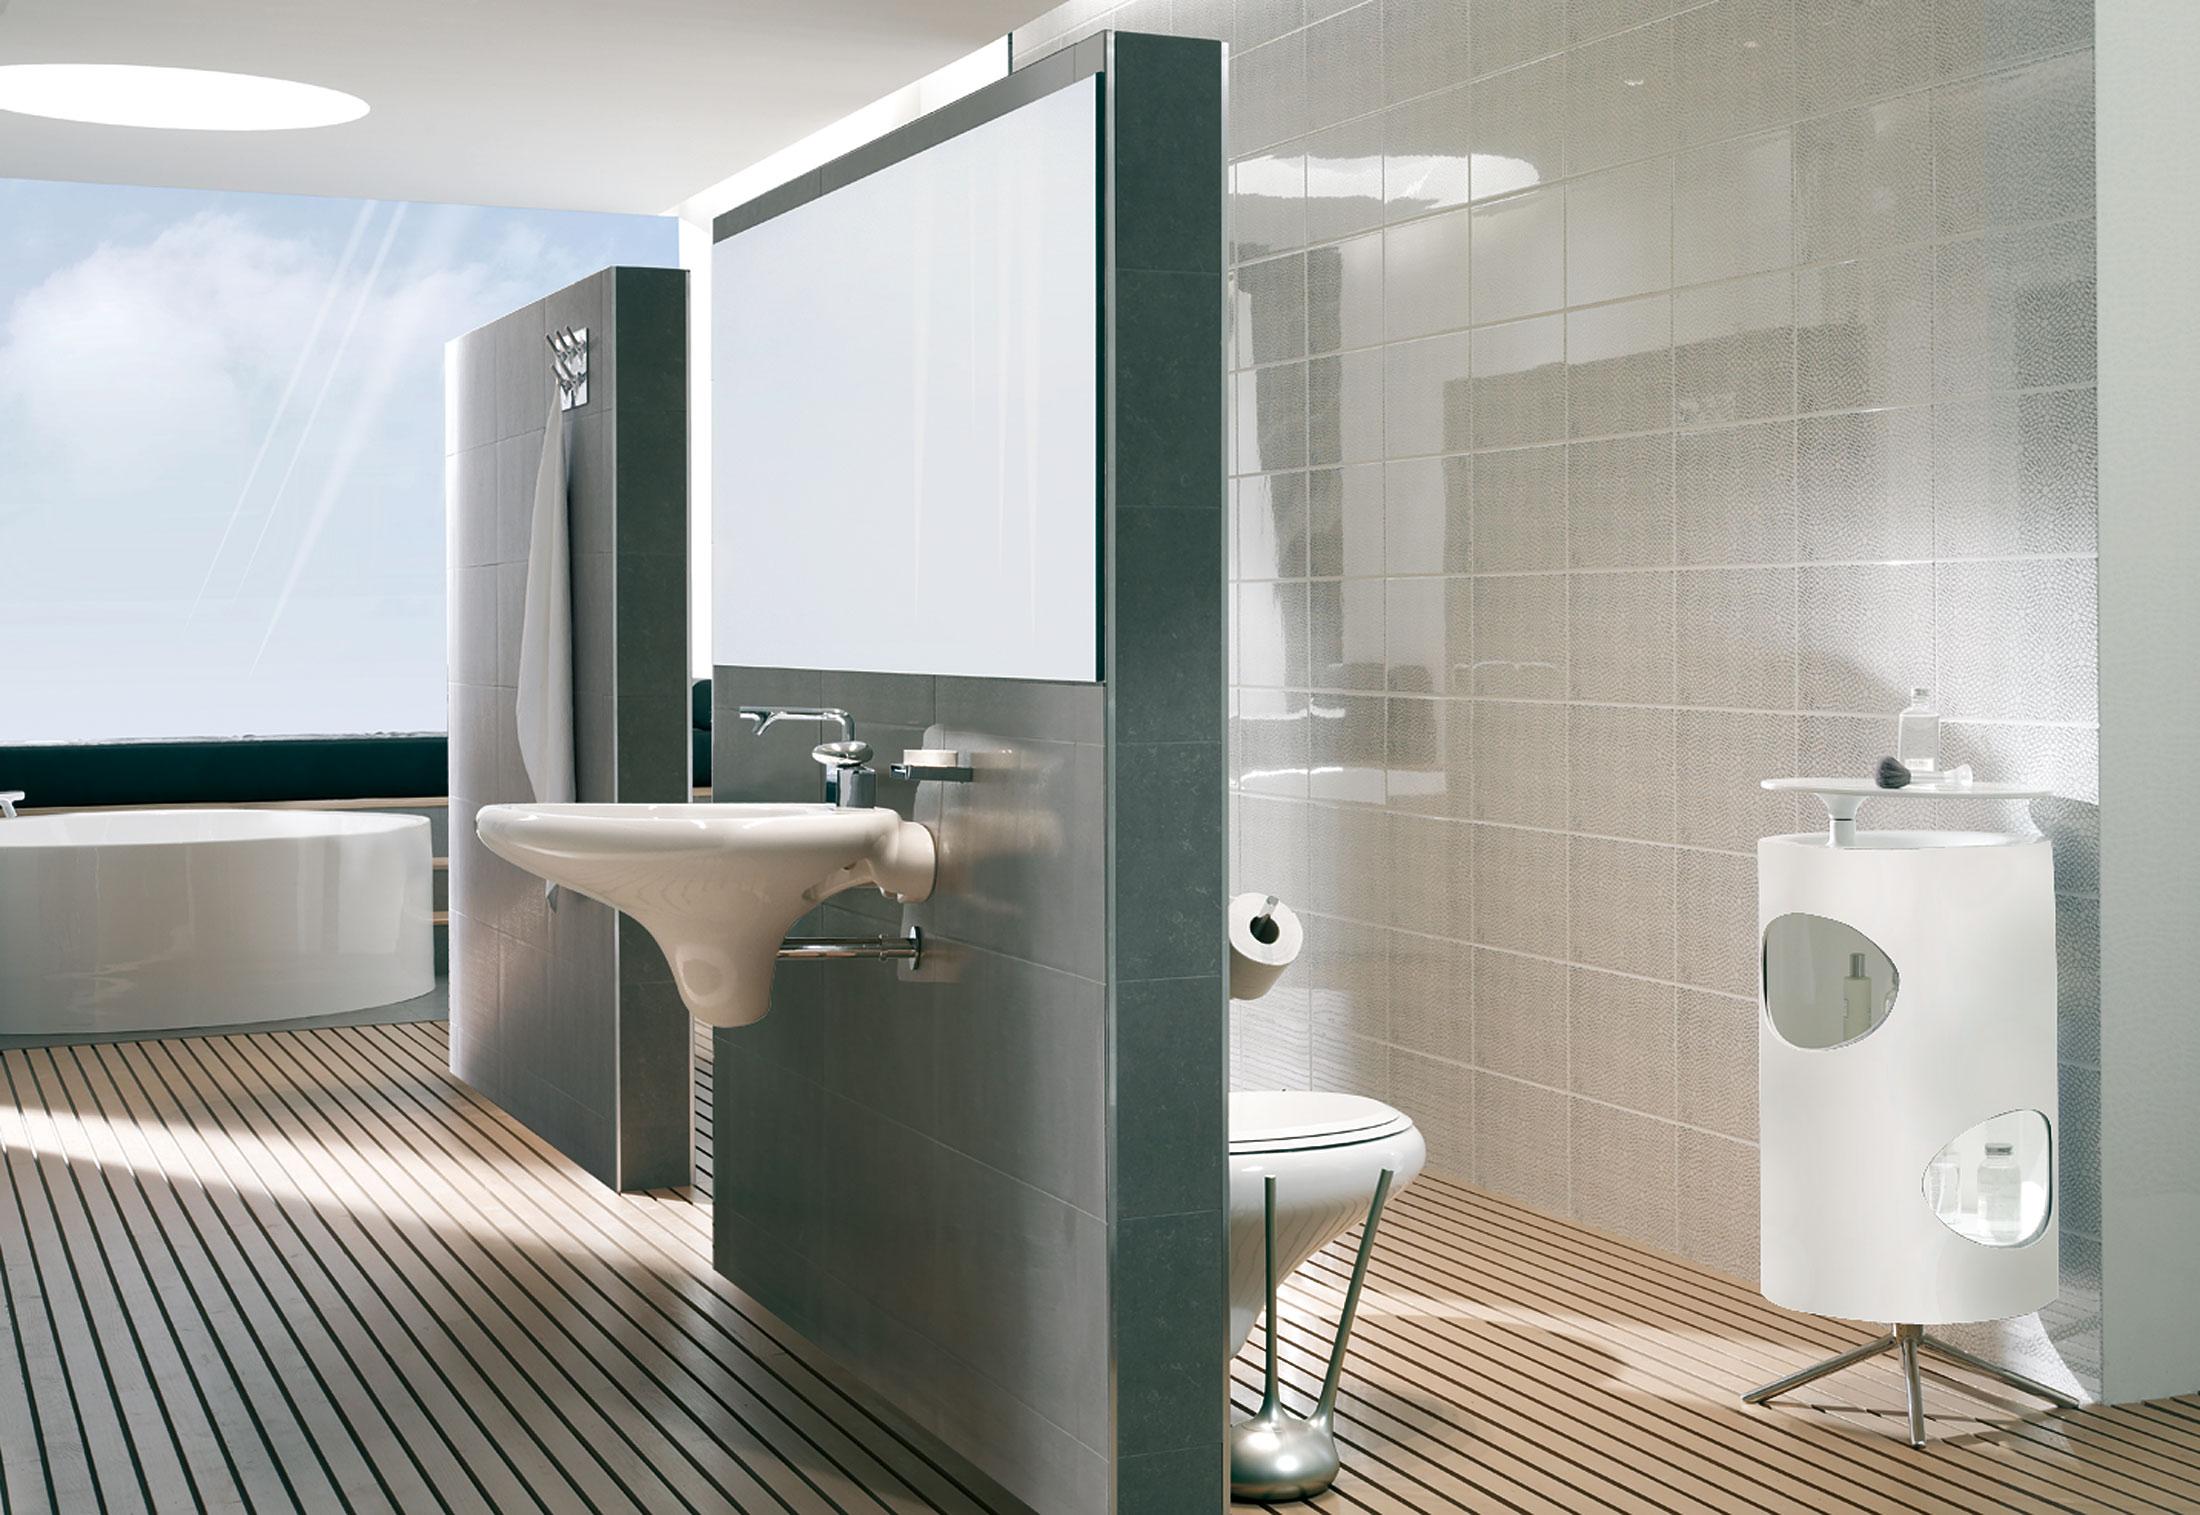 Istanbul Wc Brush Holder By Vitra Bathroom Stylepark